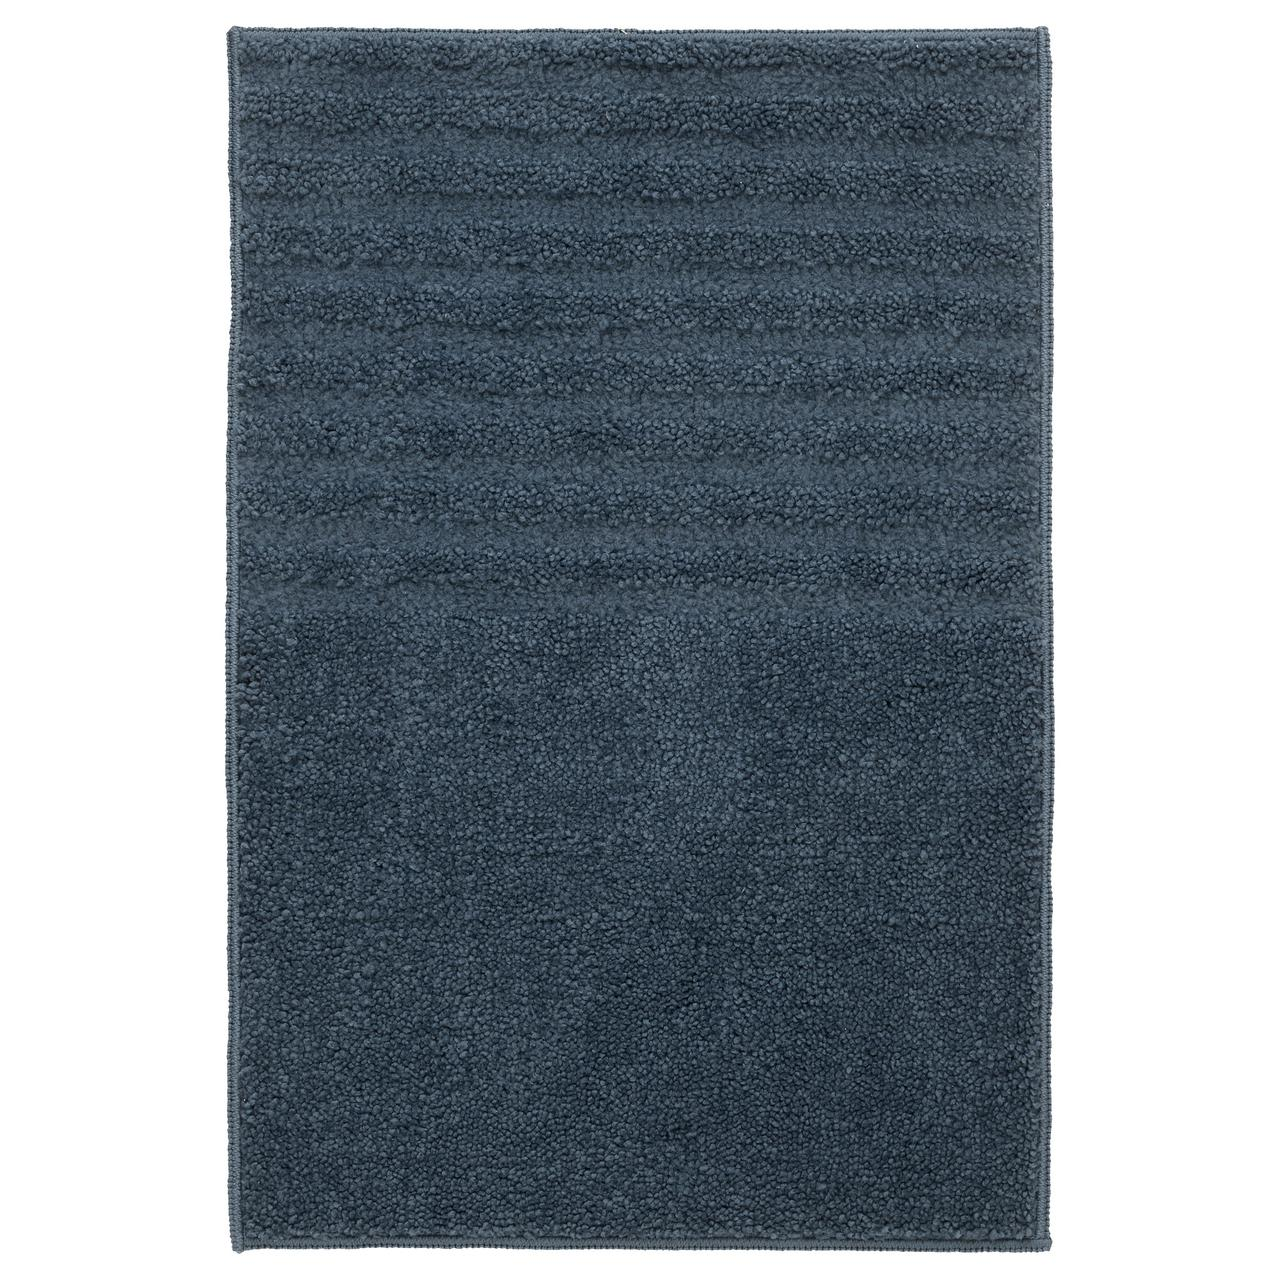 ВОКСШЁН Коврик для ванной, темно-синий